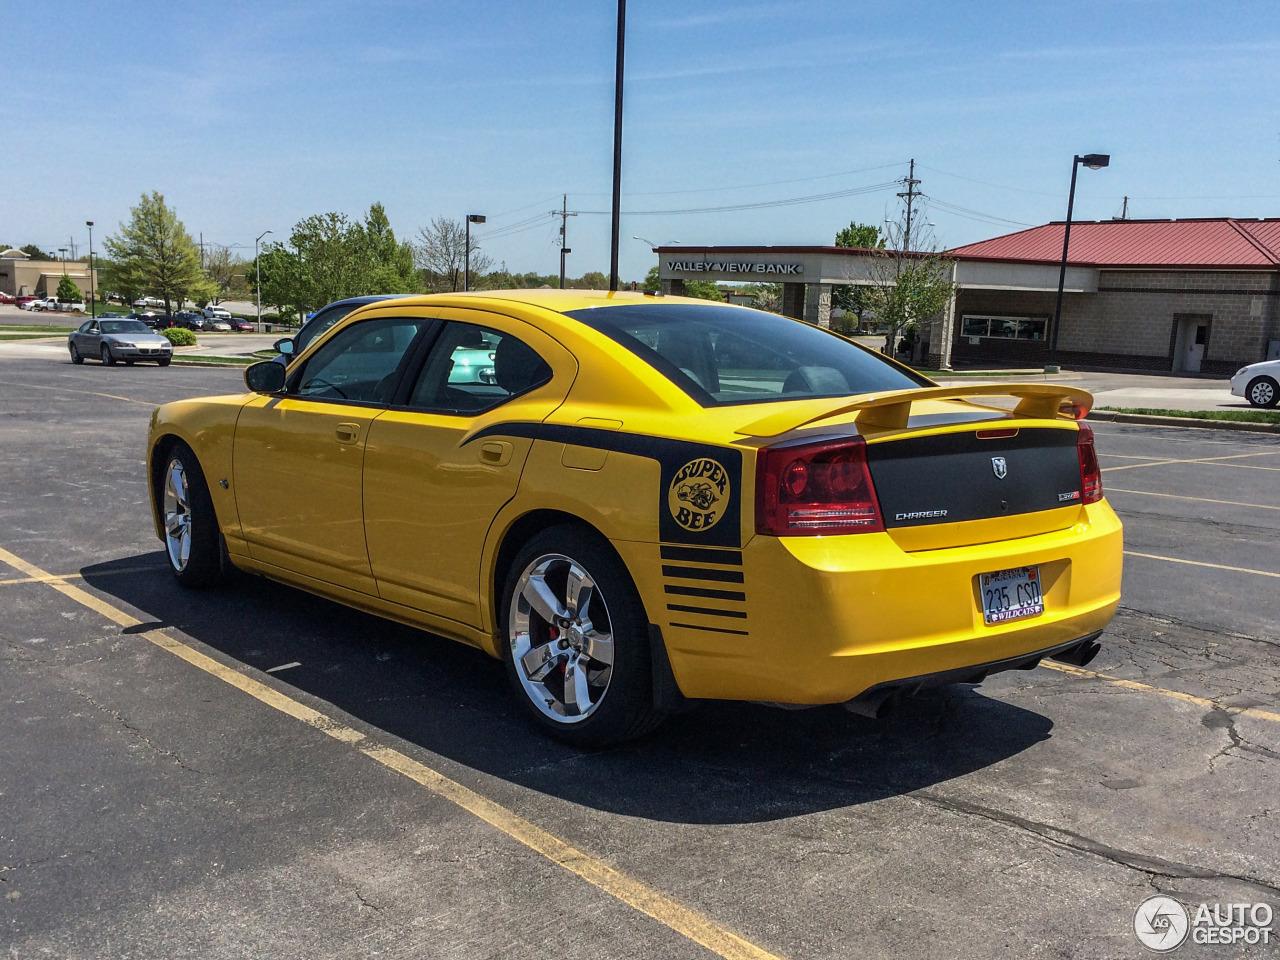 Dodge Charger Srt 8 Super Bee 7 June 2014 Autogespot